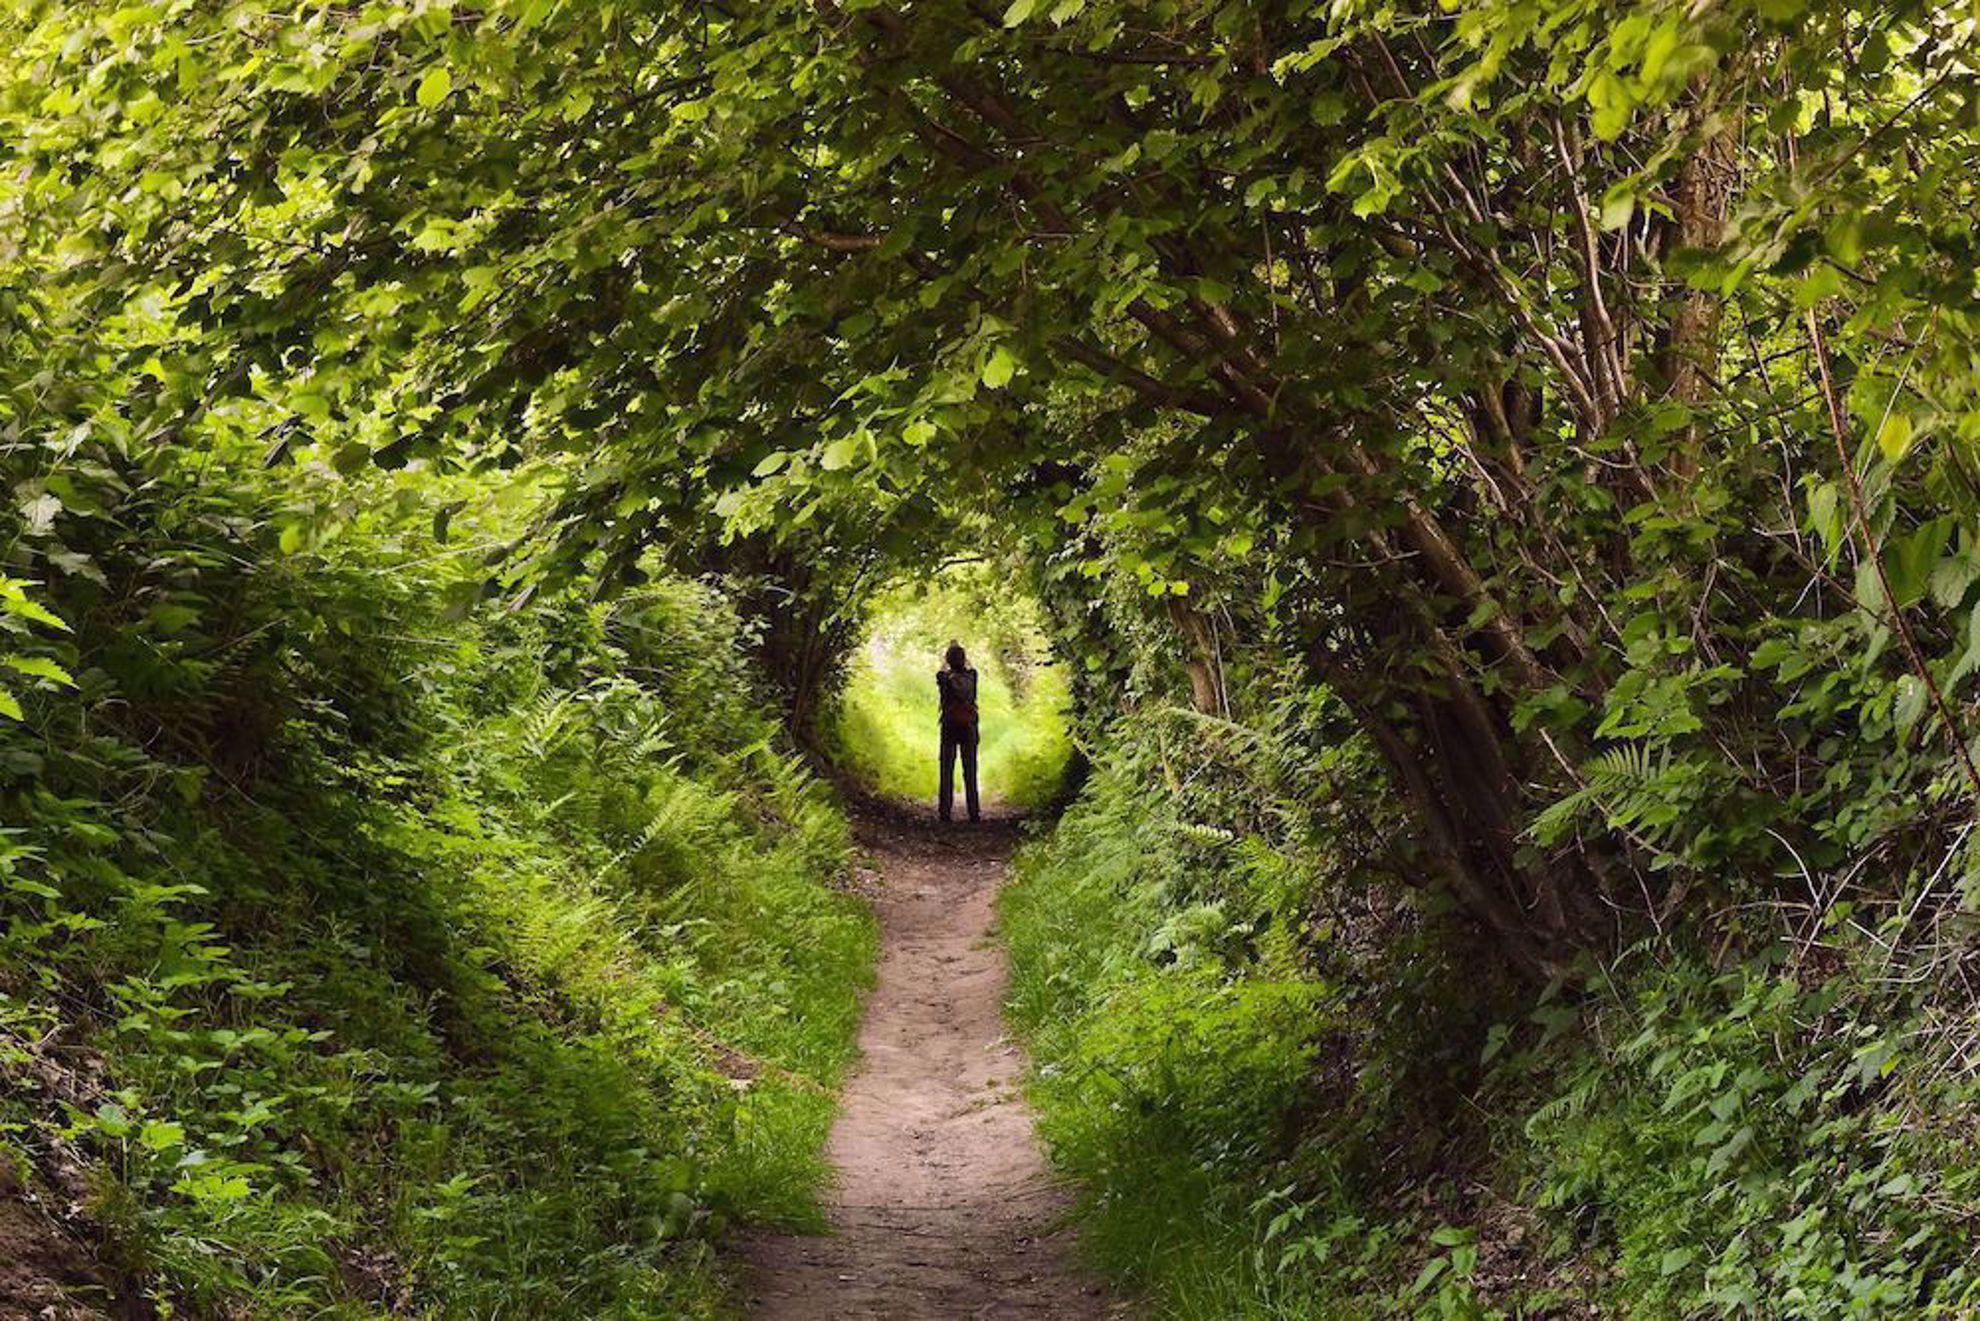 Hiking in green tunnel